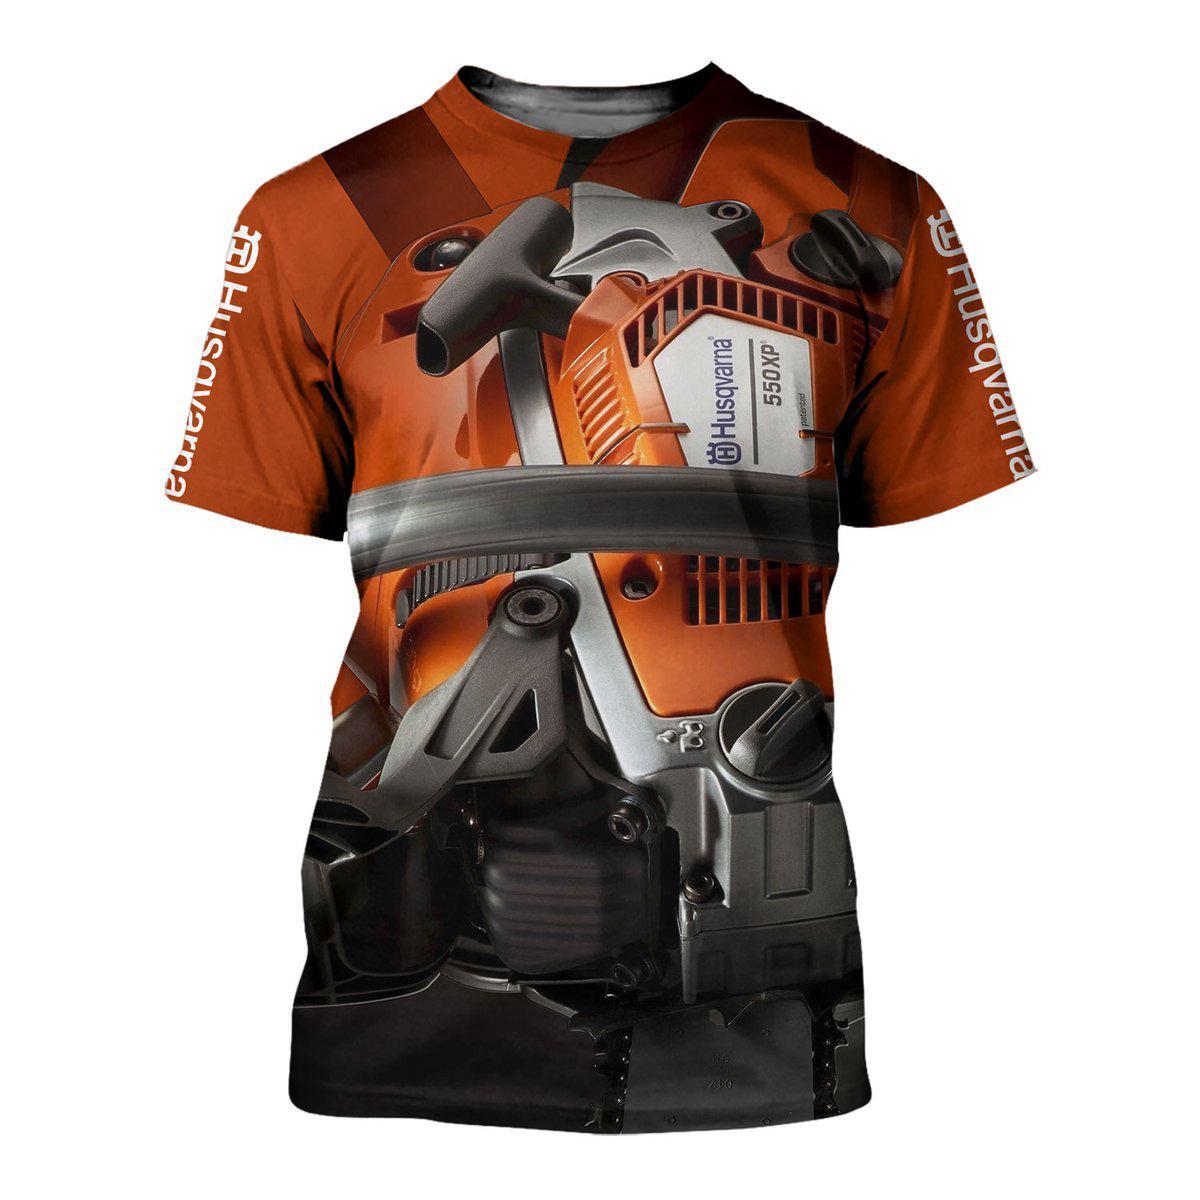 Husqvarna chainsaw all over printed tshirt